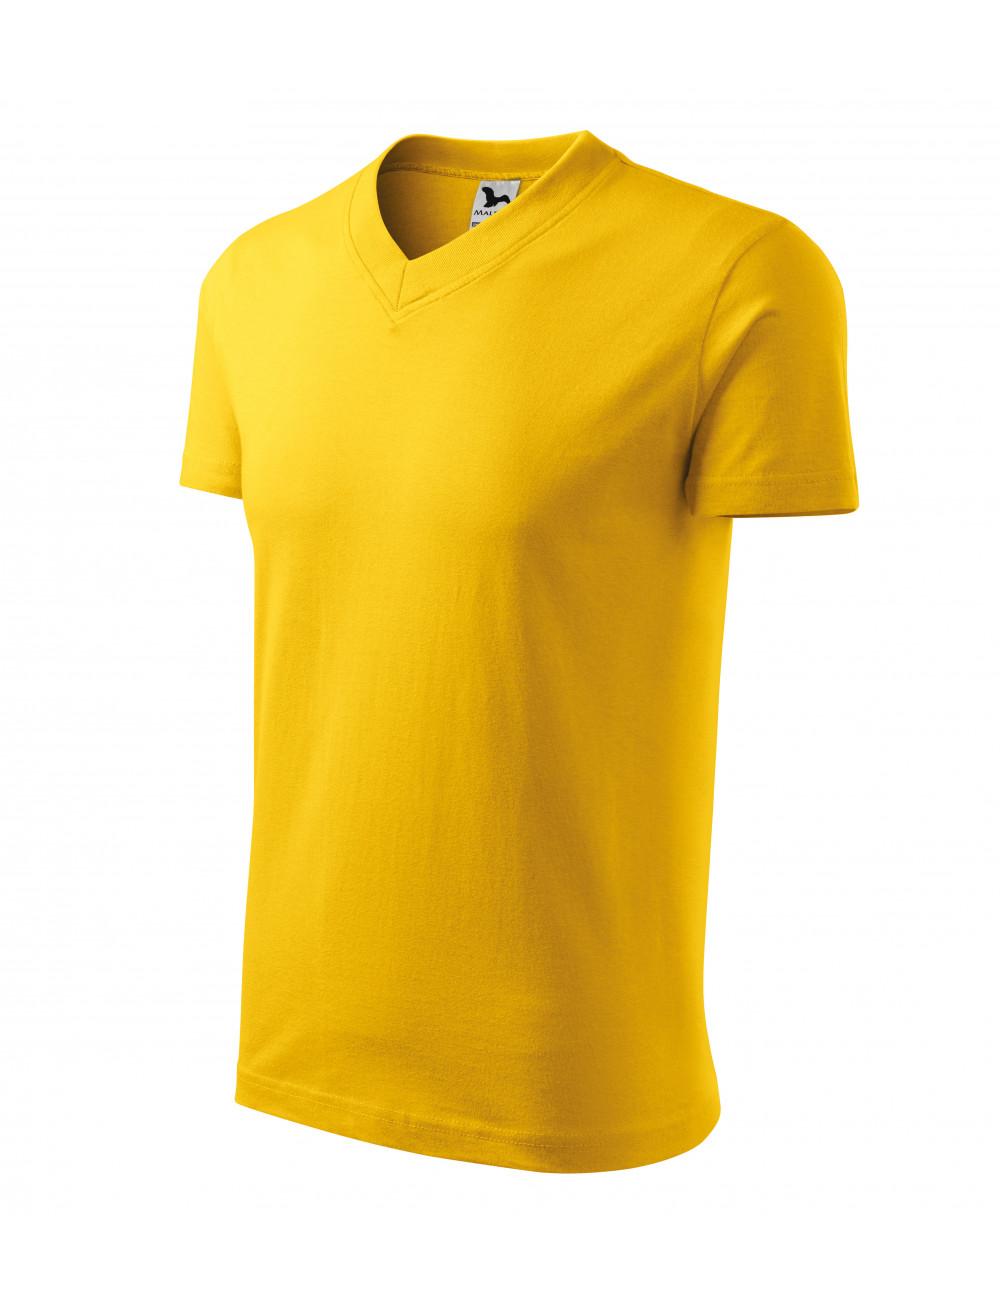 Adler MALFINI Koszulka unisex V-neck 102 żółty